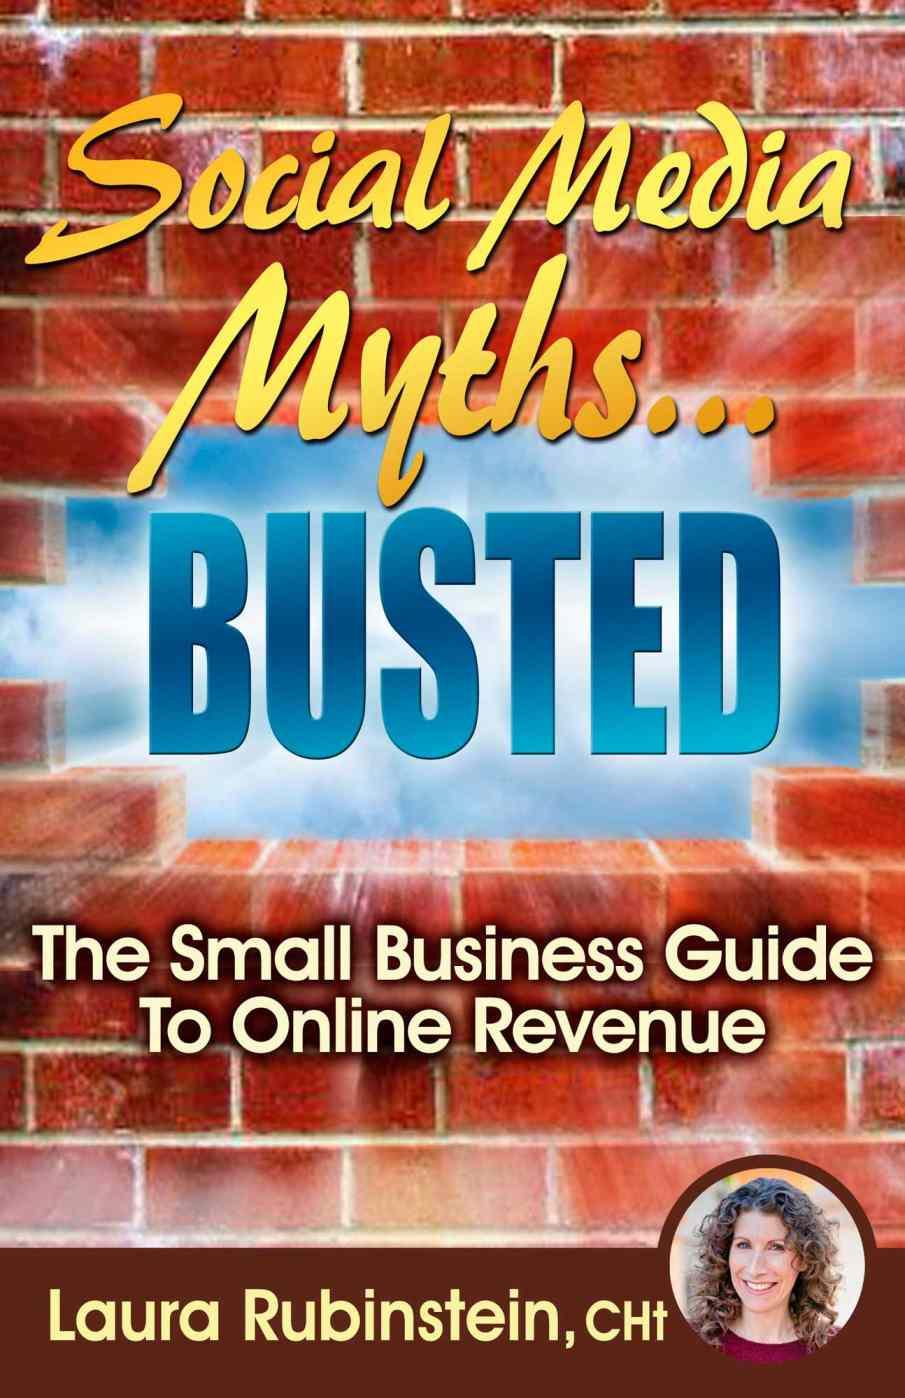 social-media-myths-busted-book-laura-rubinstein